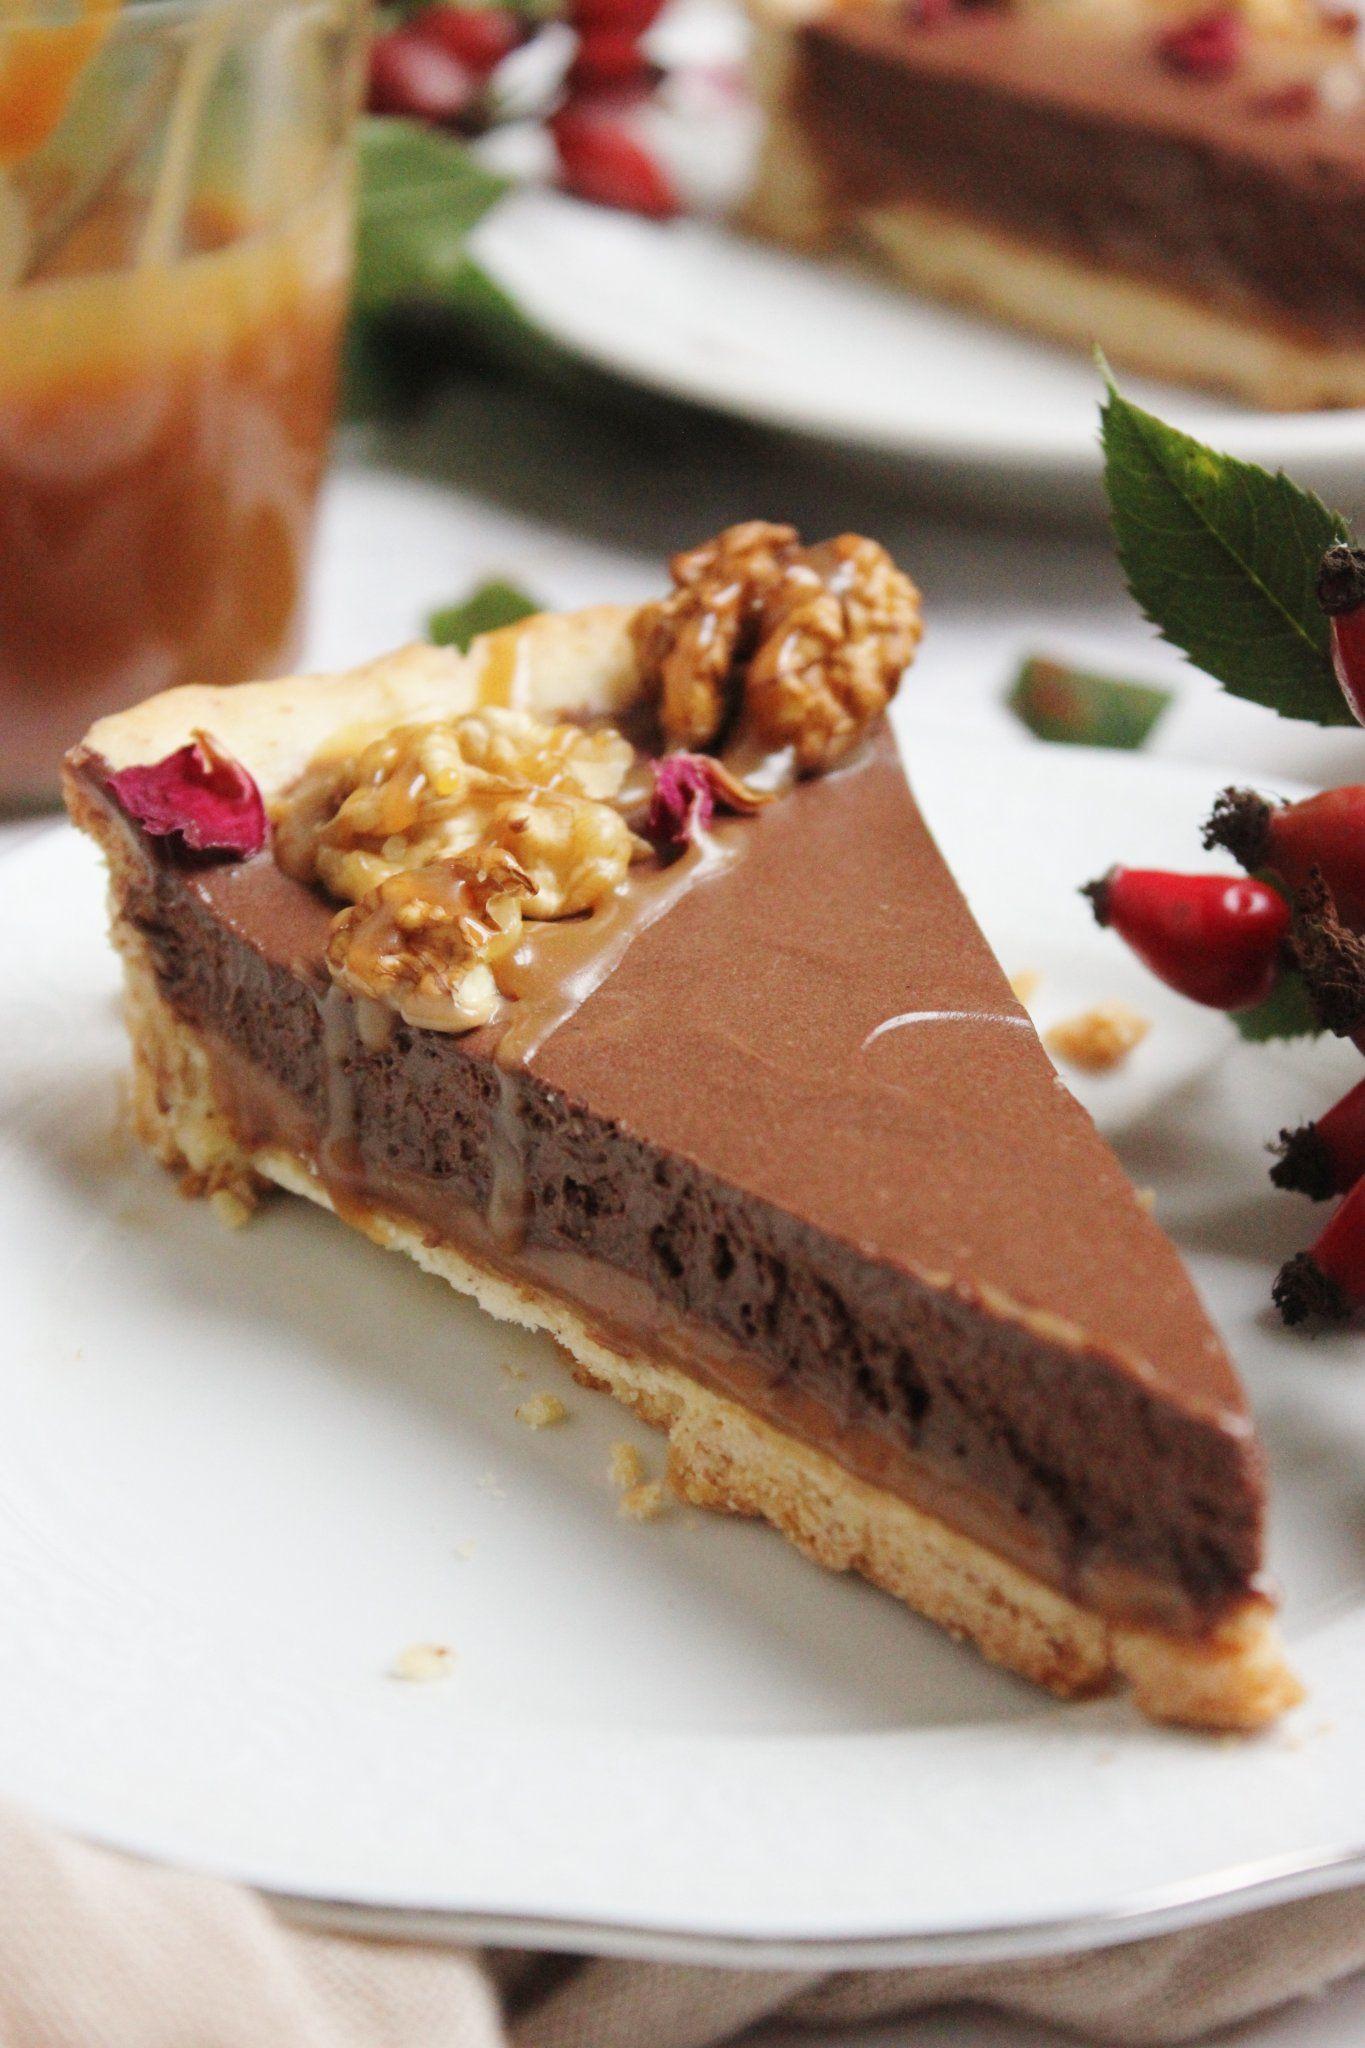 csokis pite sutemeny recept